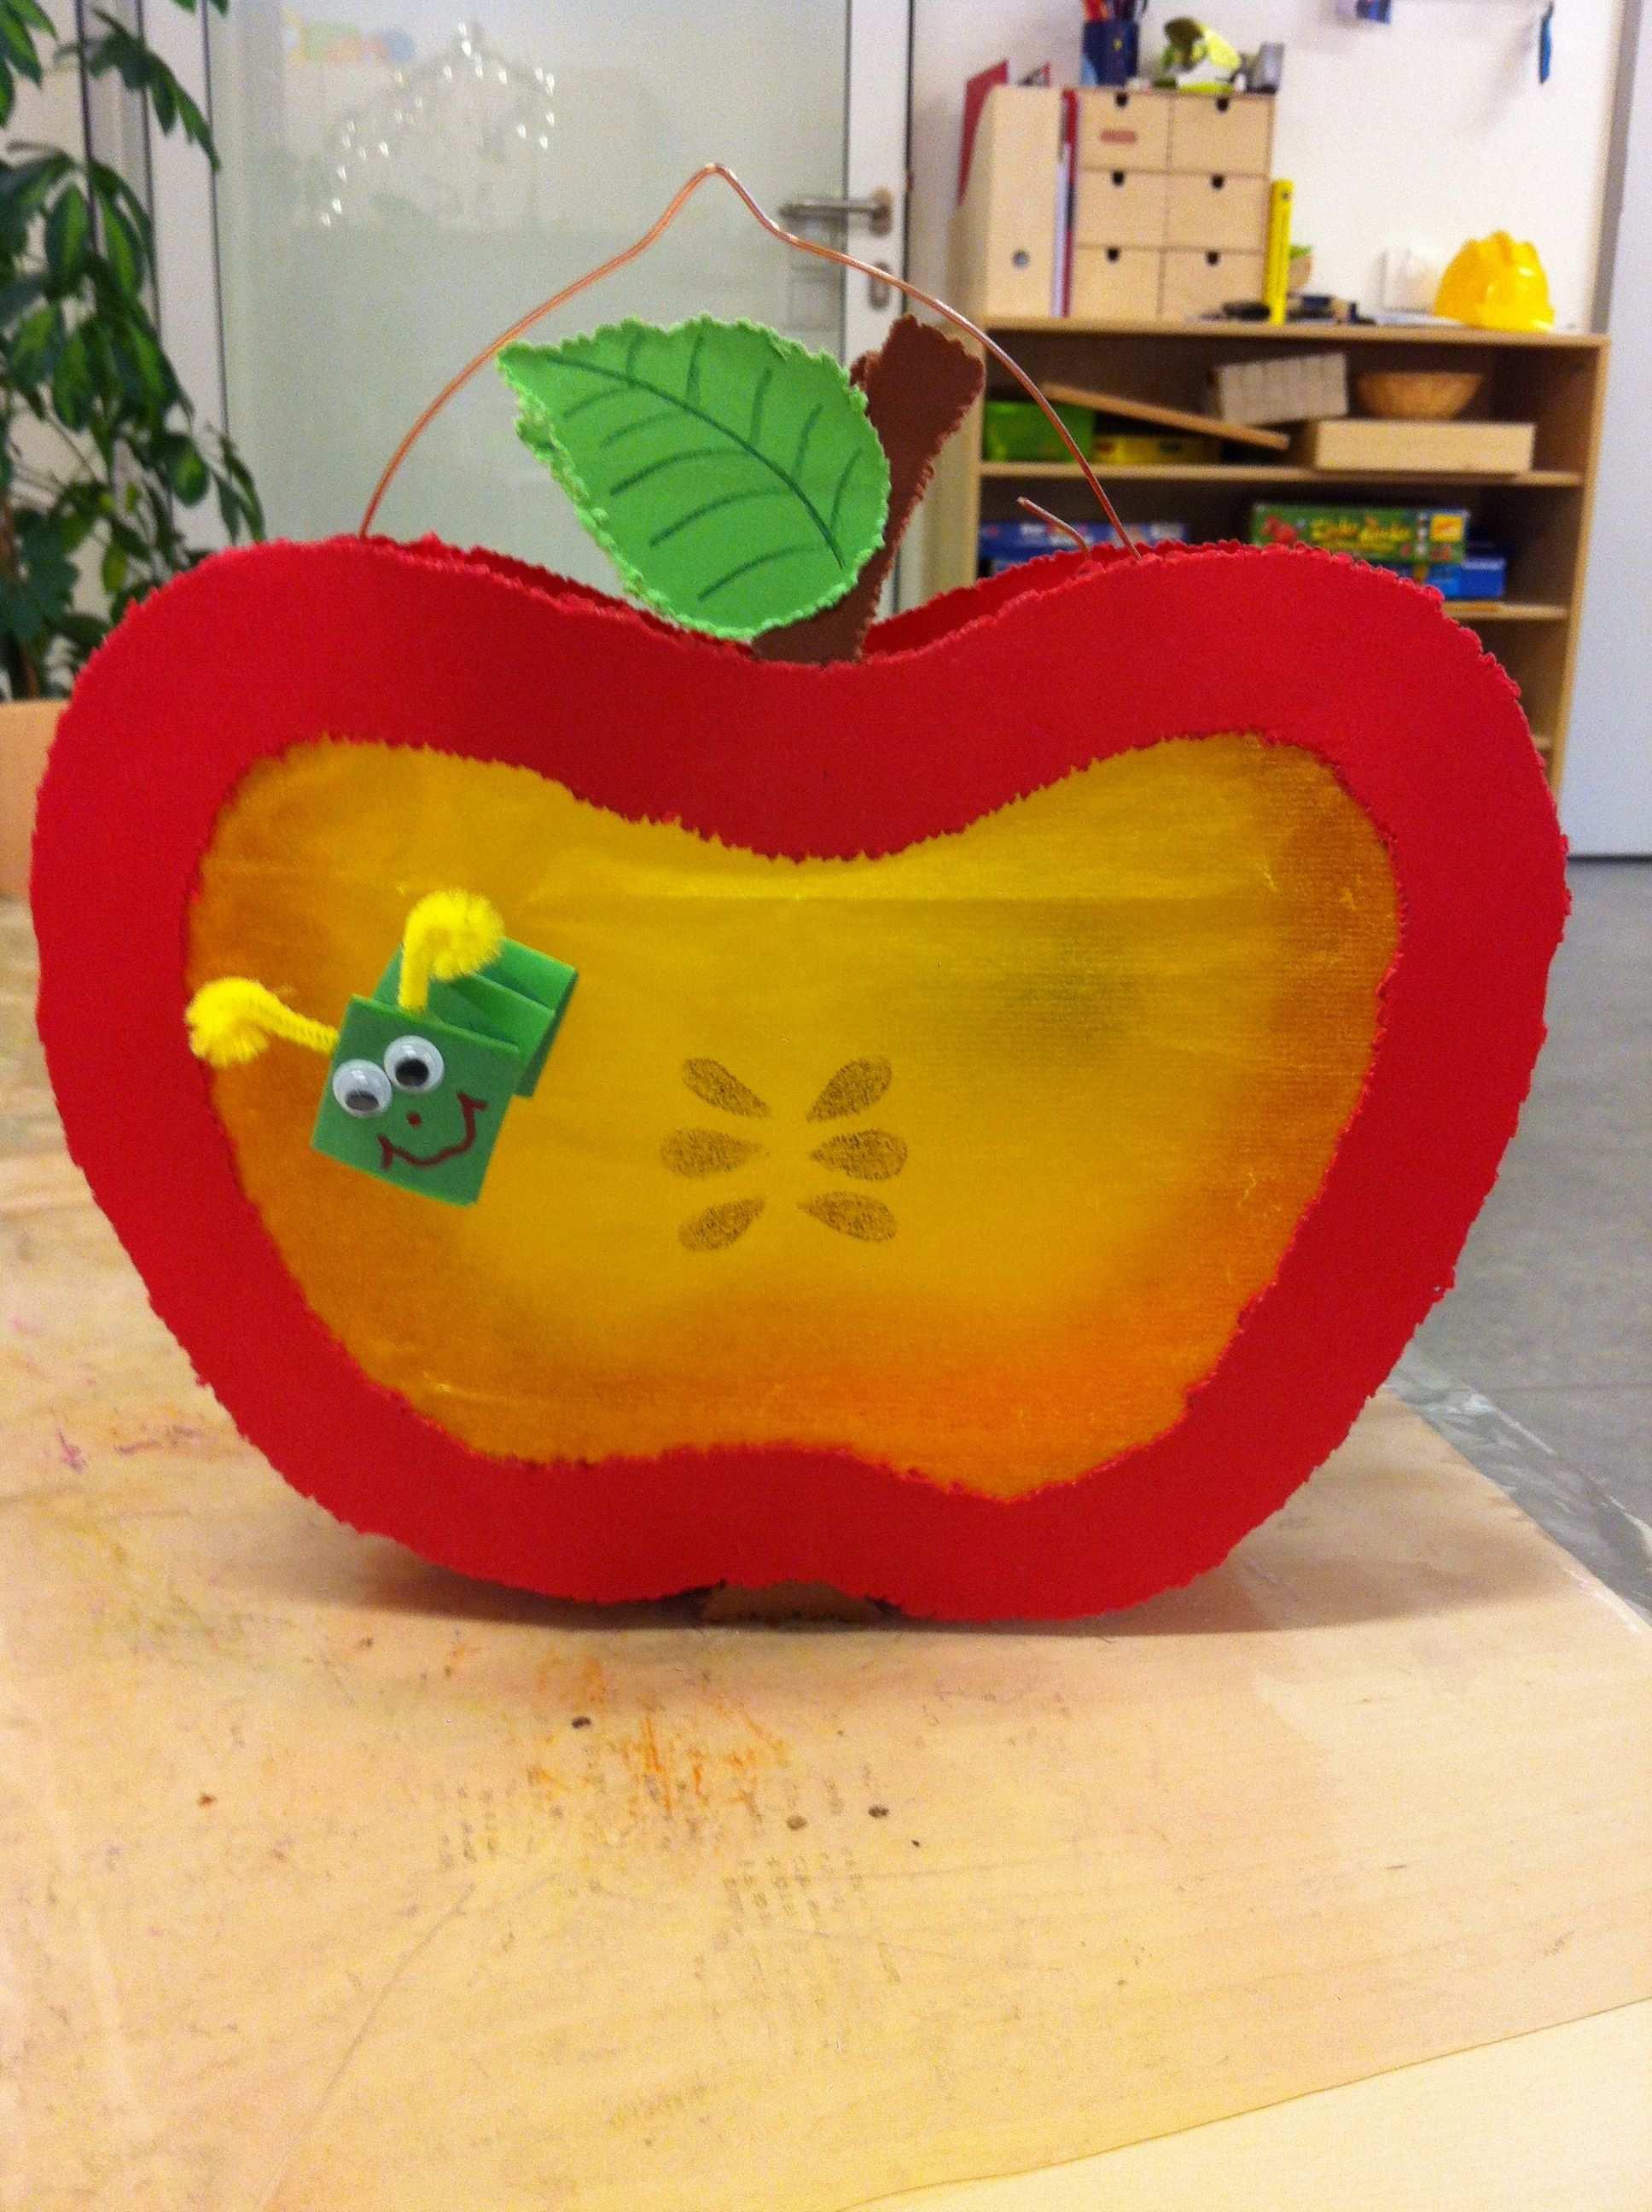 Laterne Apfel Kinder Basteln Laternen Laternen Basteln Laterne Basteln Vorlagen